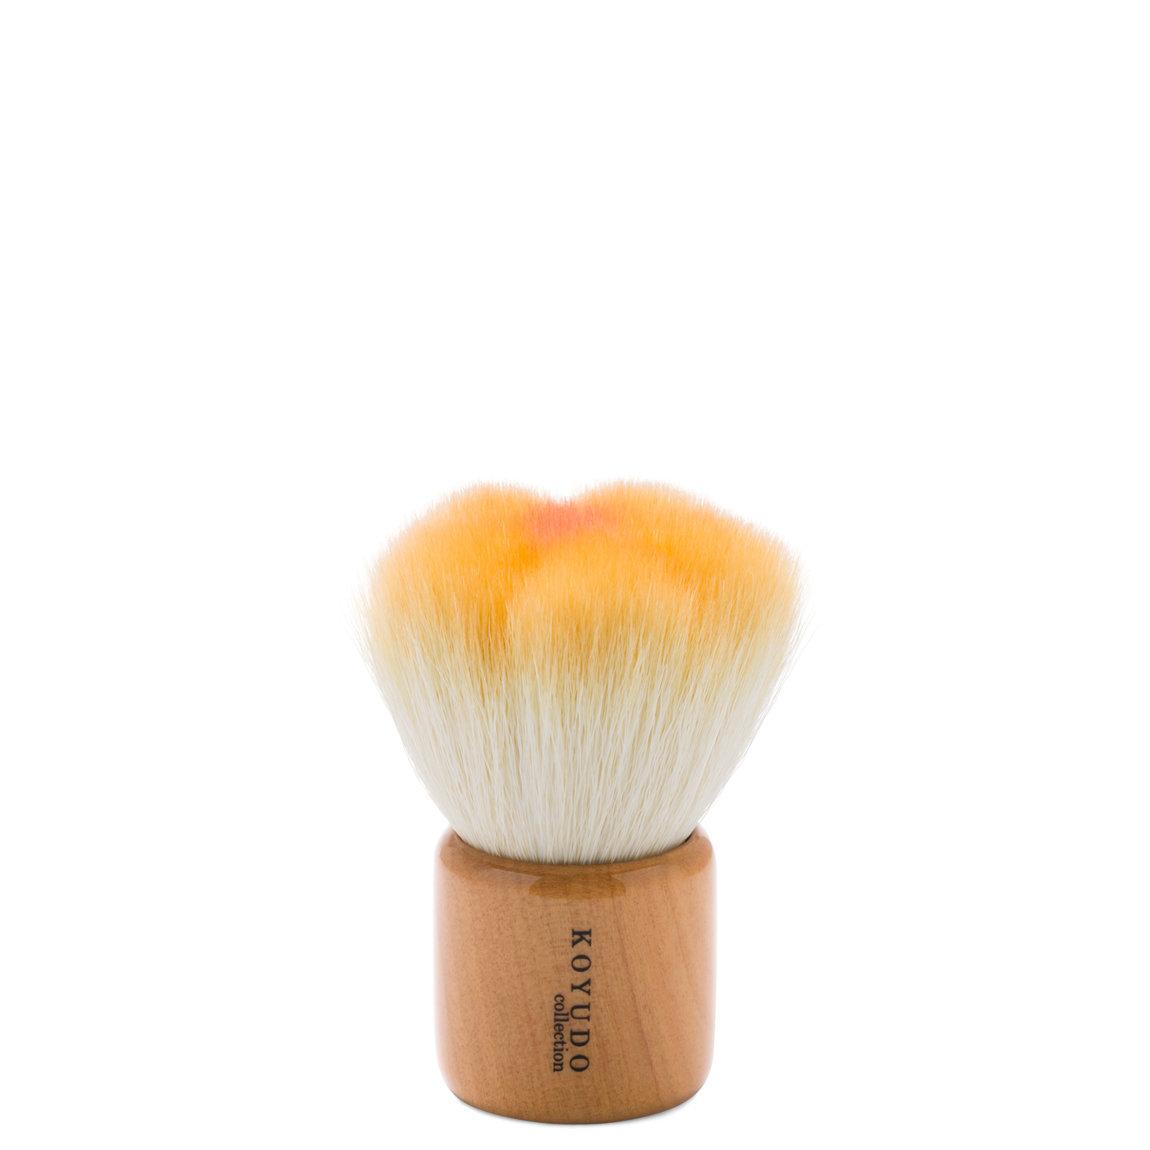 KOYUDO Innovative Series F002 Powder/Blush Brush - Orange product swatch.